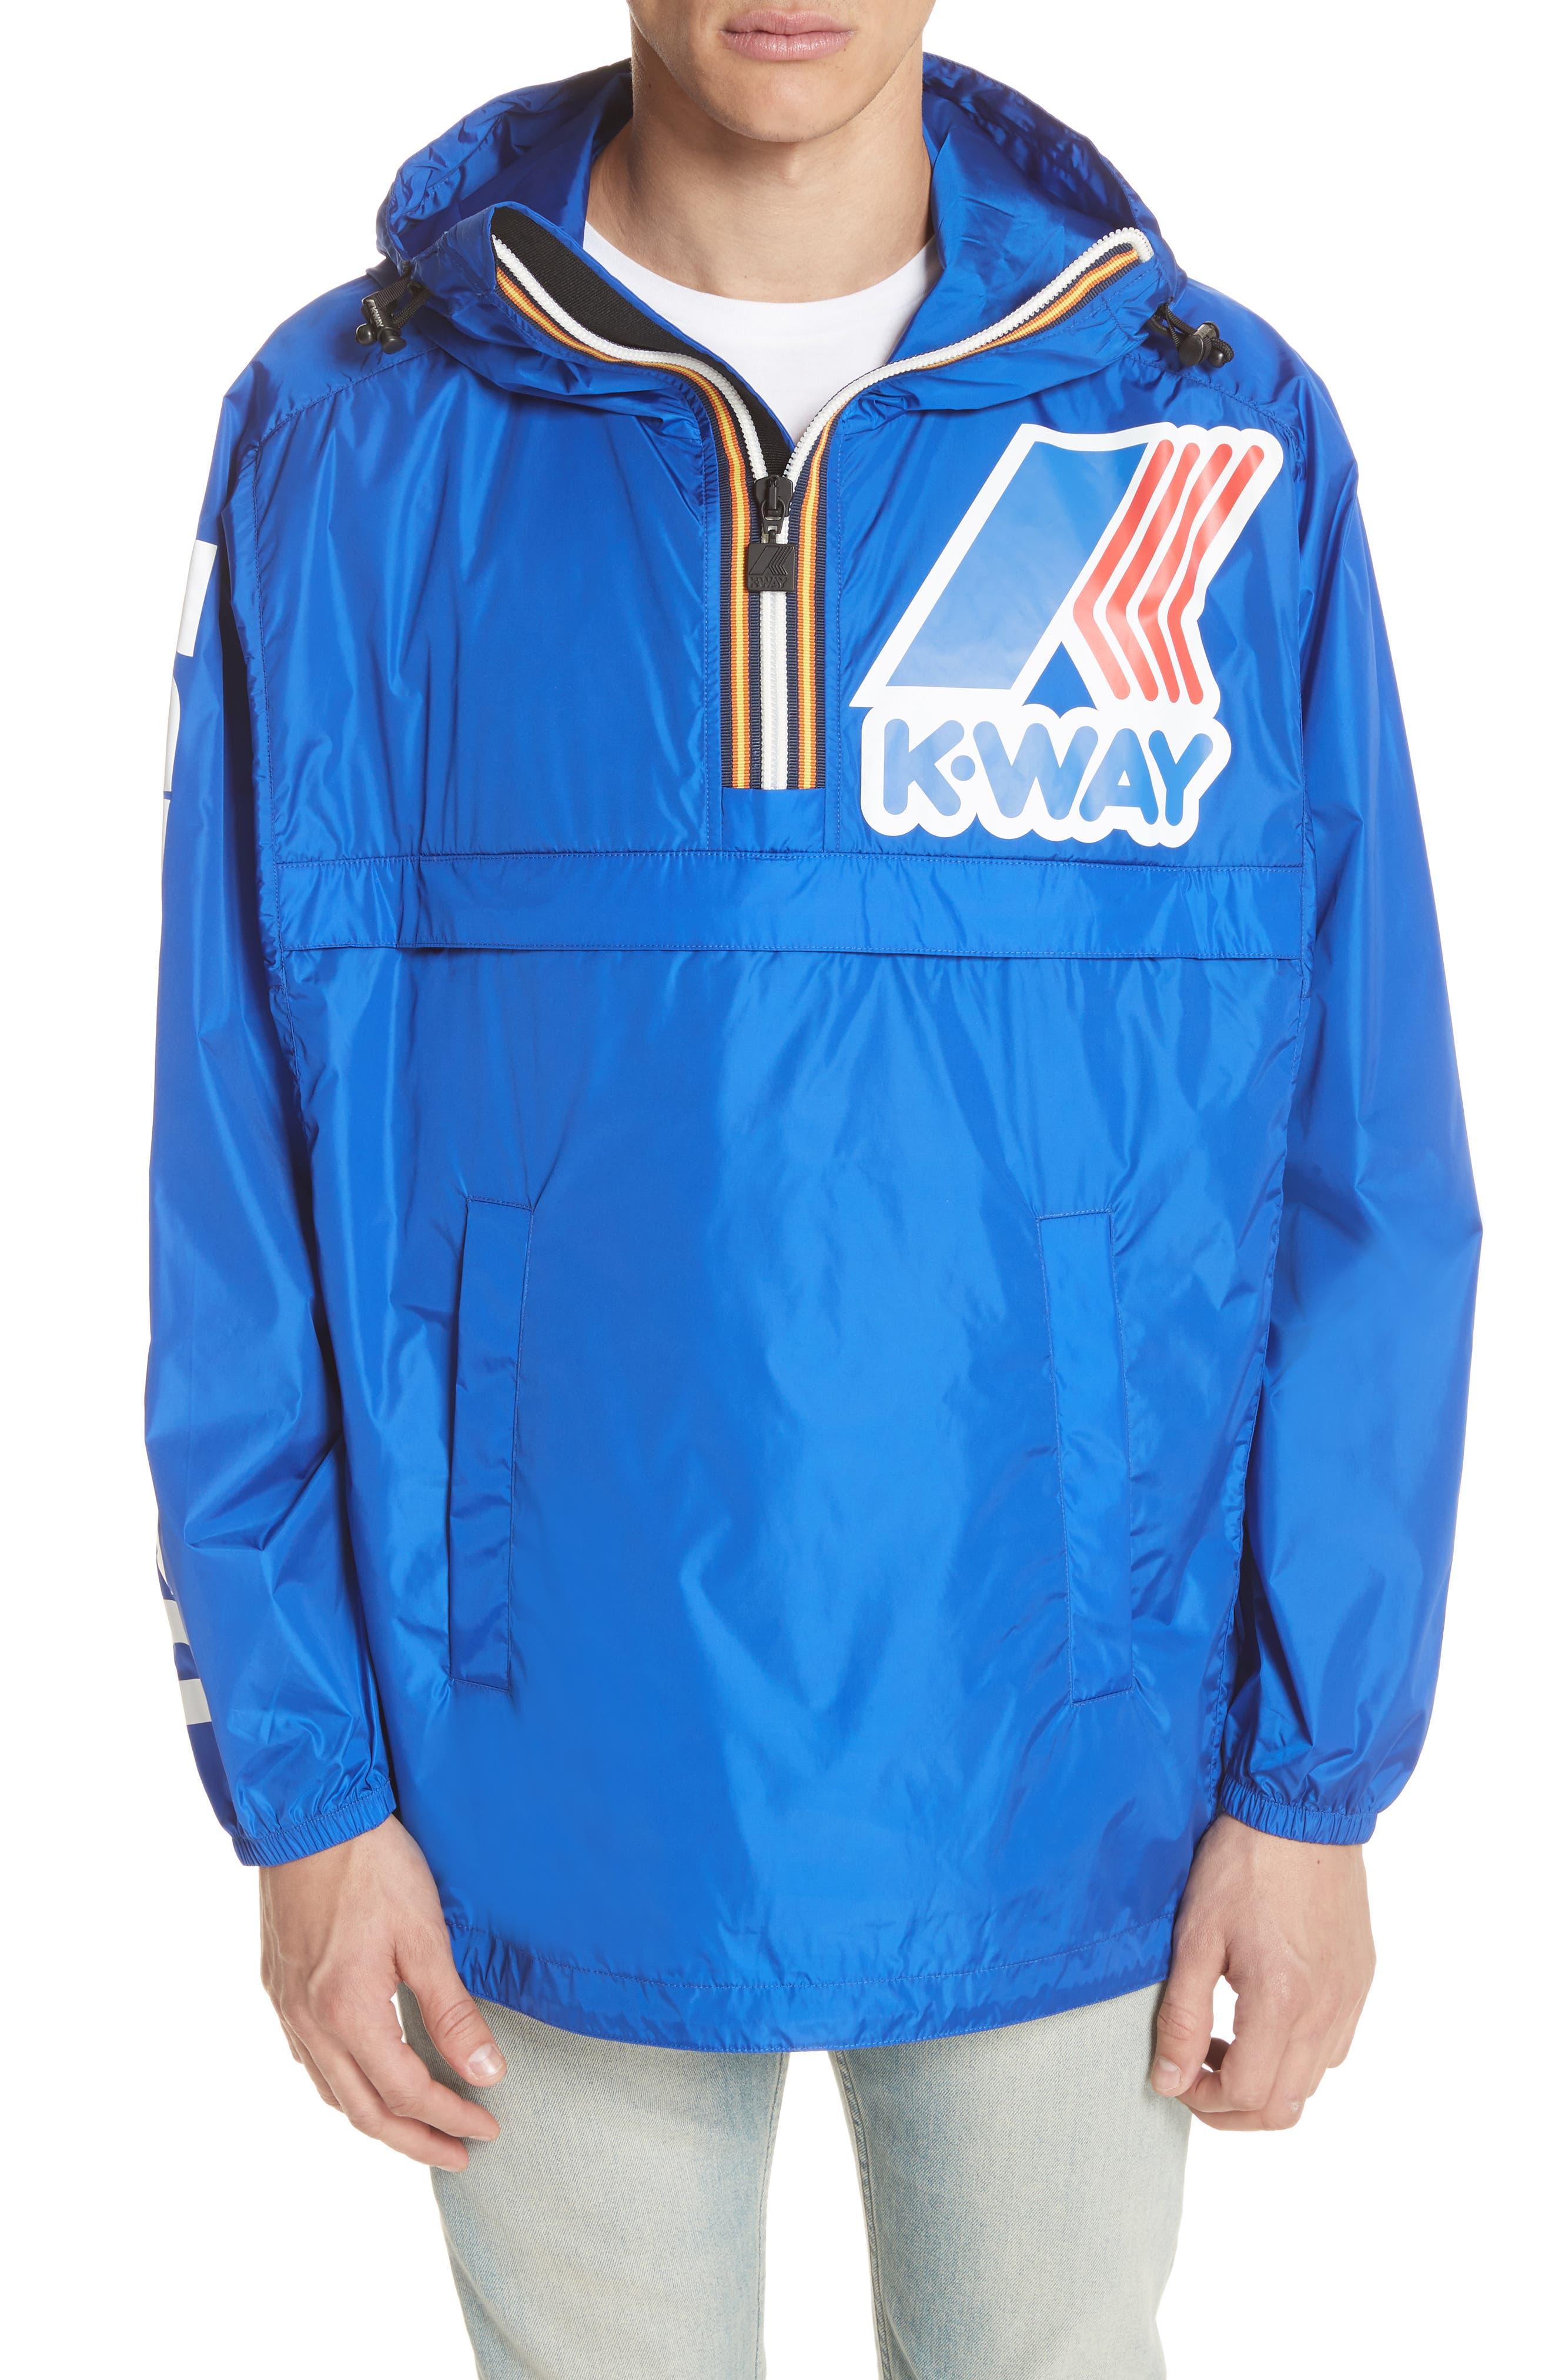 x K-Way Windbreaker,                         Main,                         color, 440